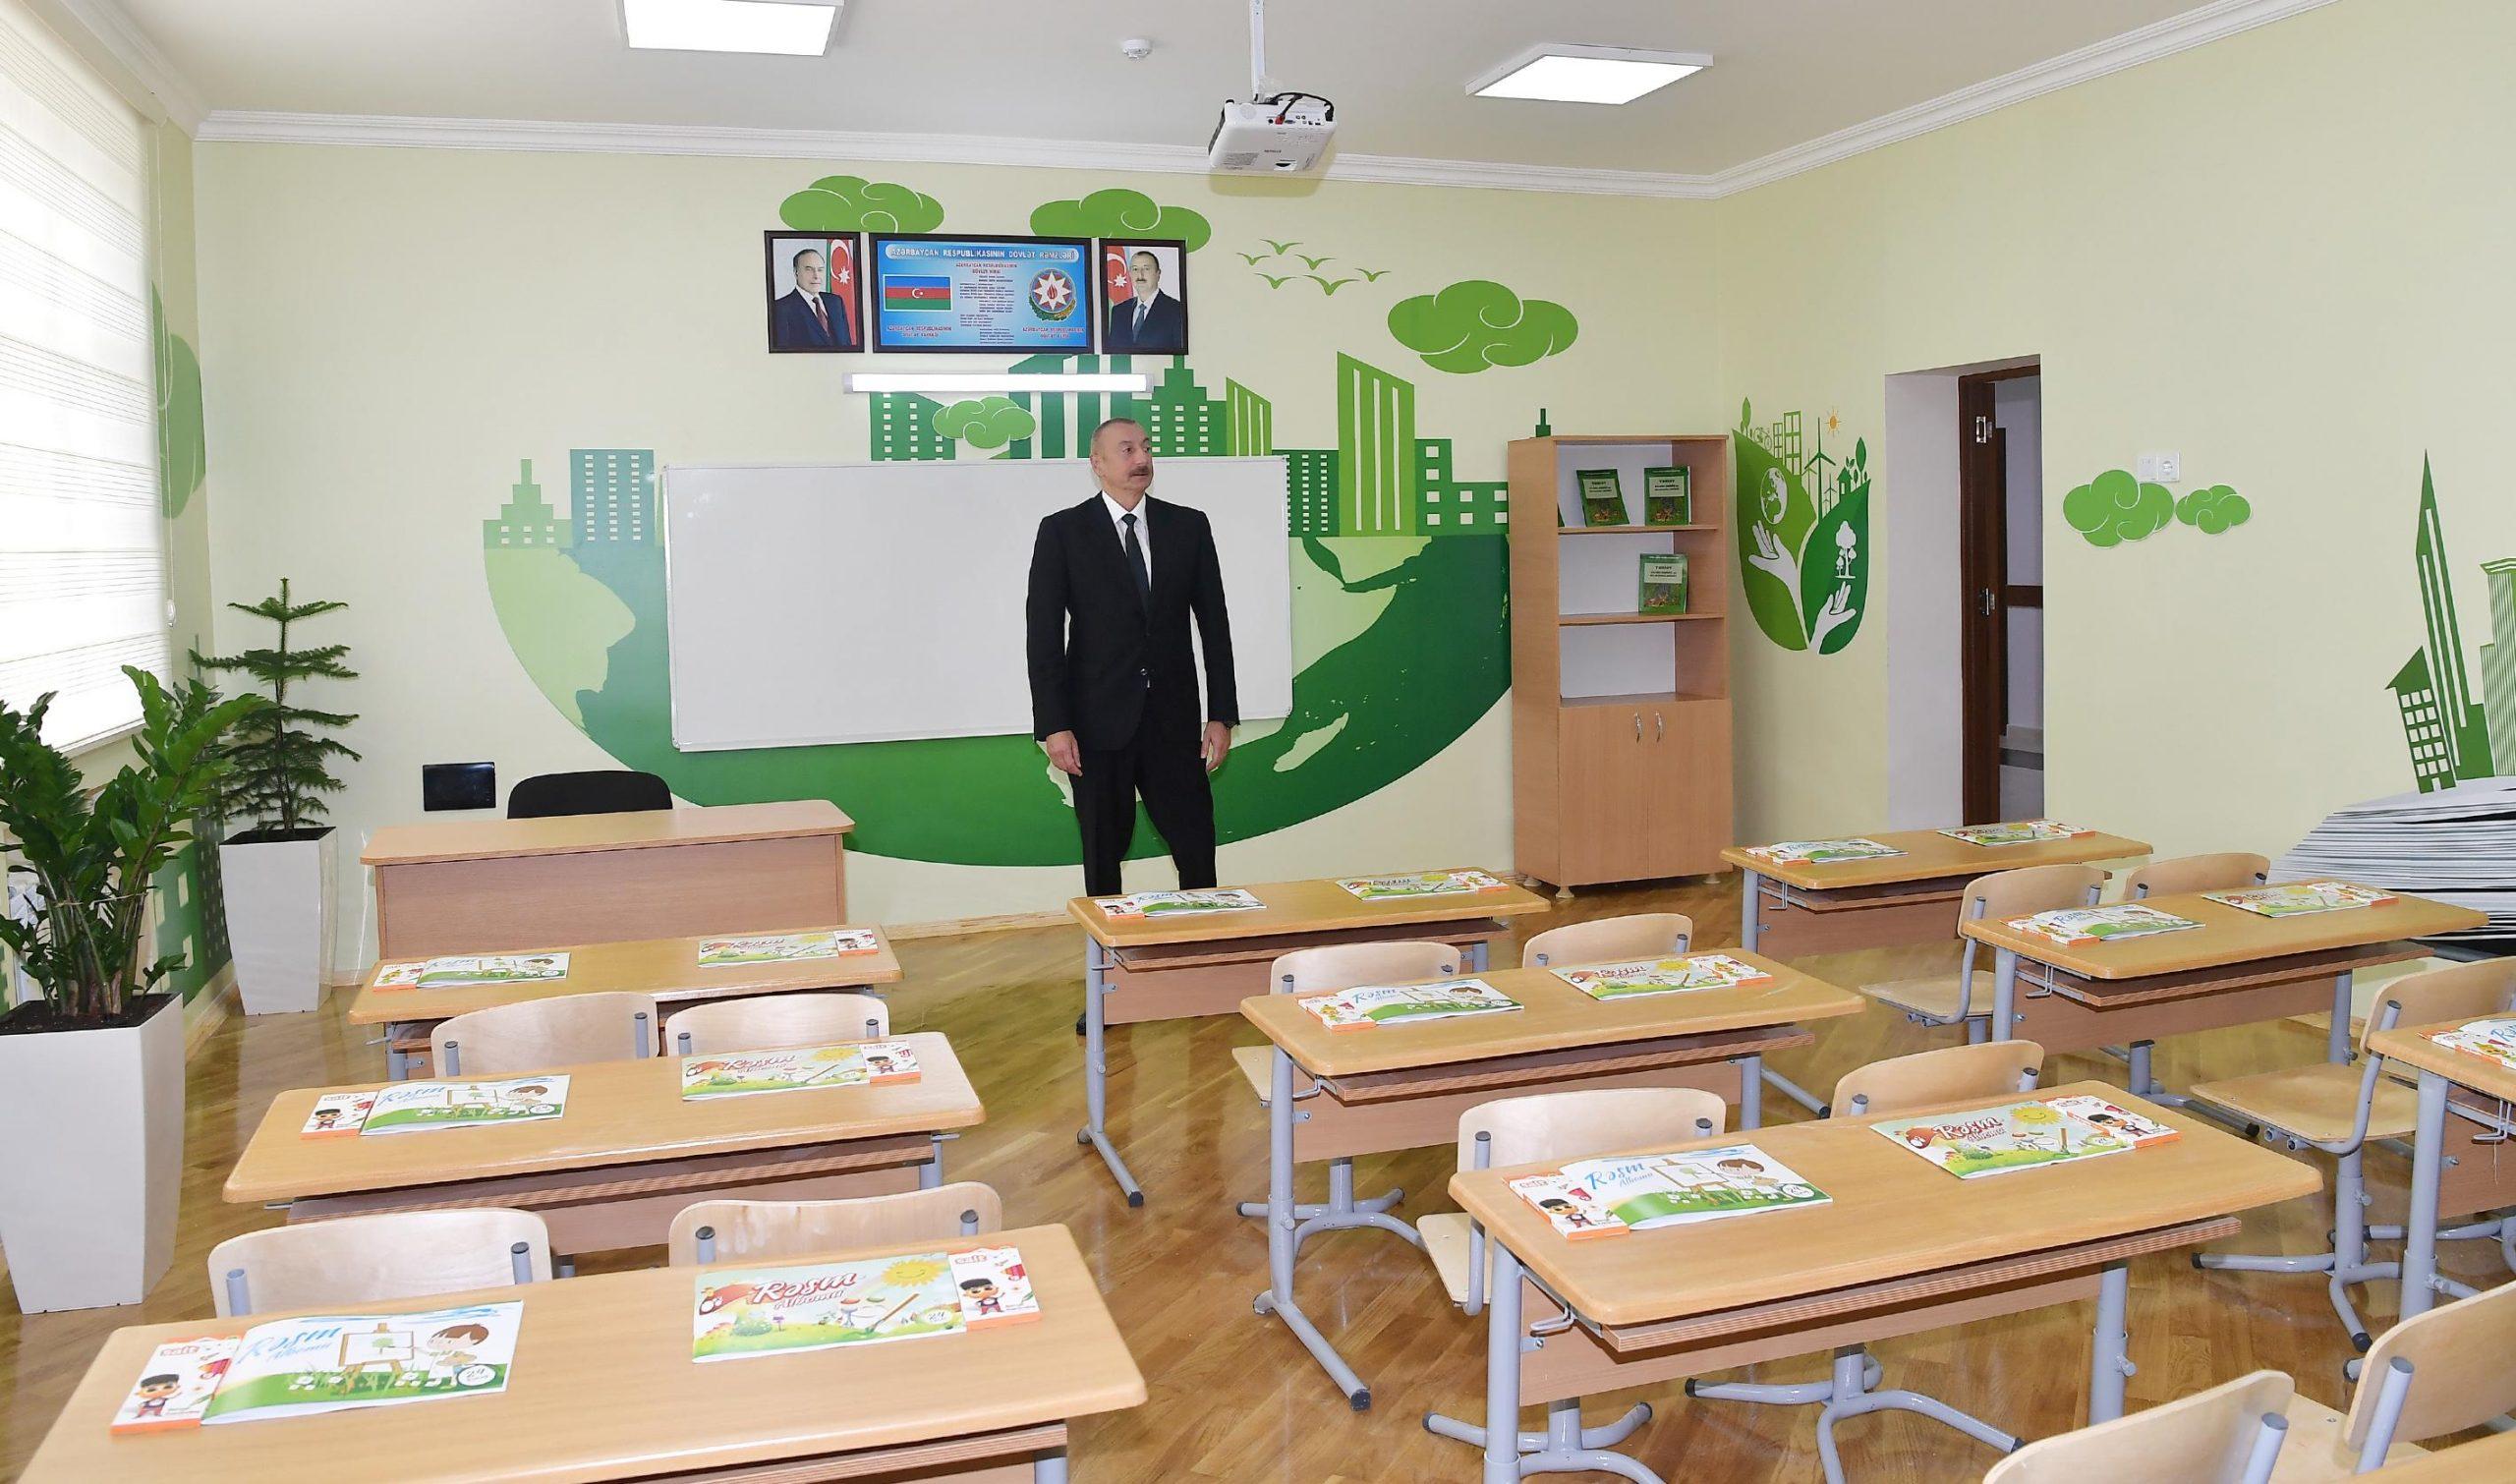 lham Əliyev6 scaled